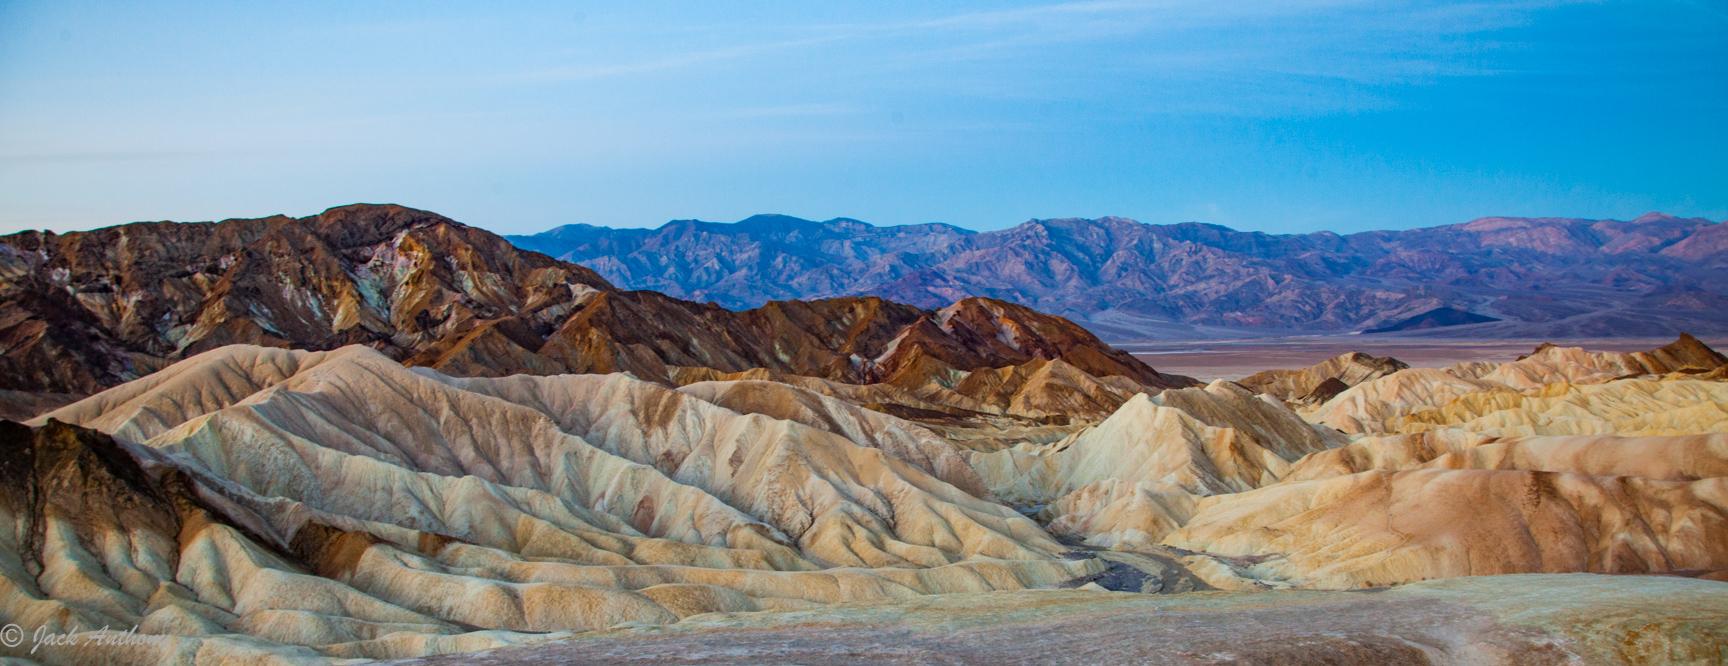 View at Zabriska Point, Death Valley NP, CA